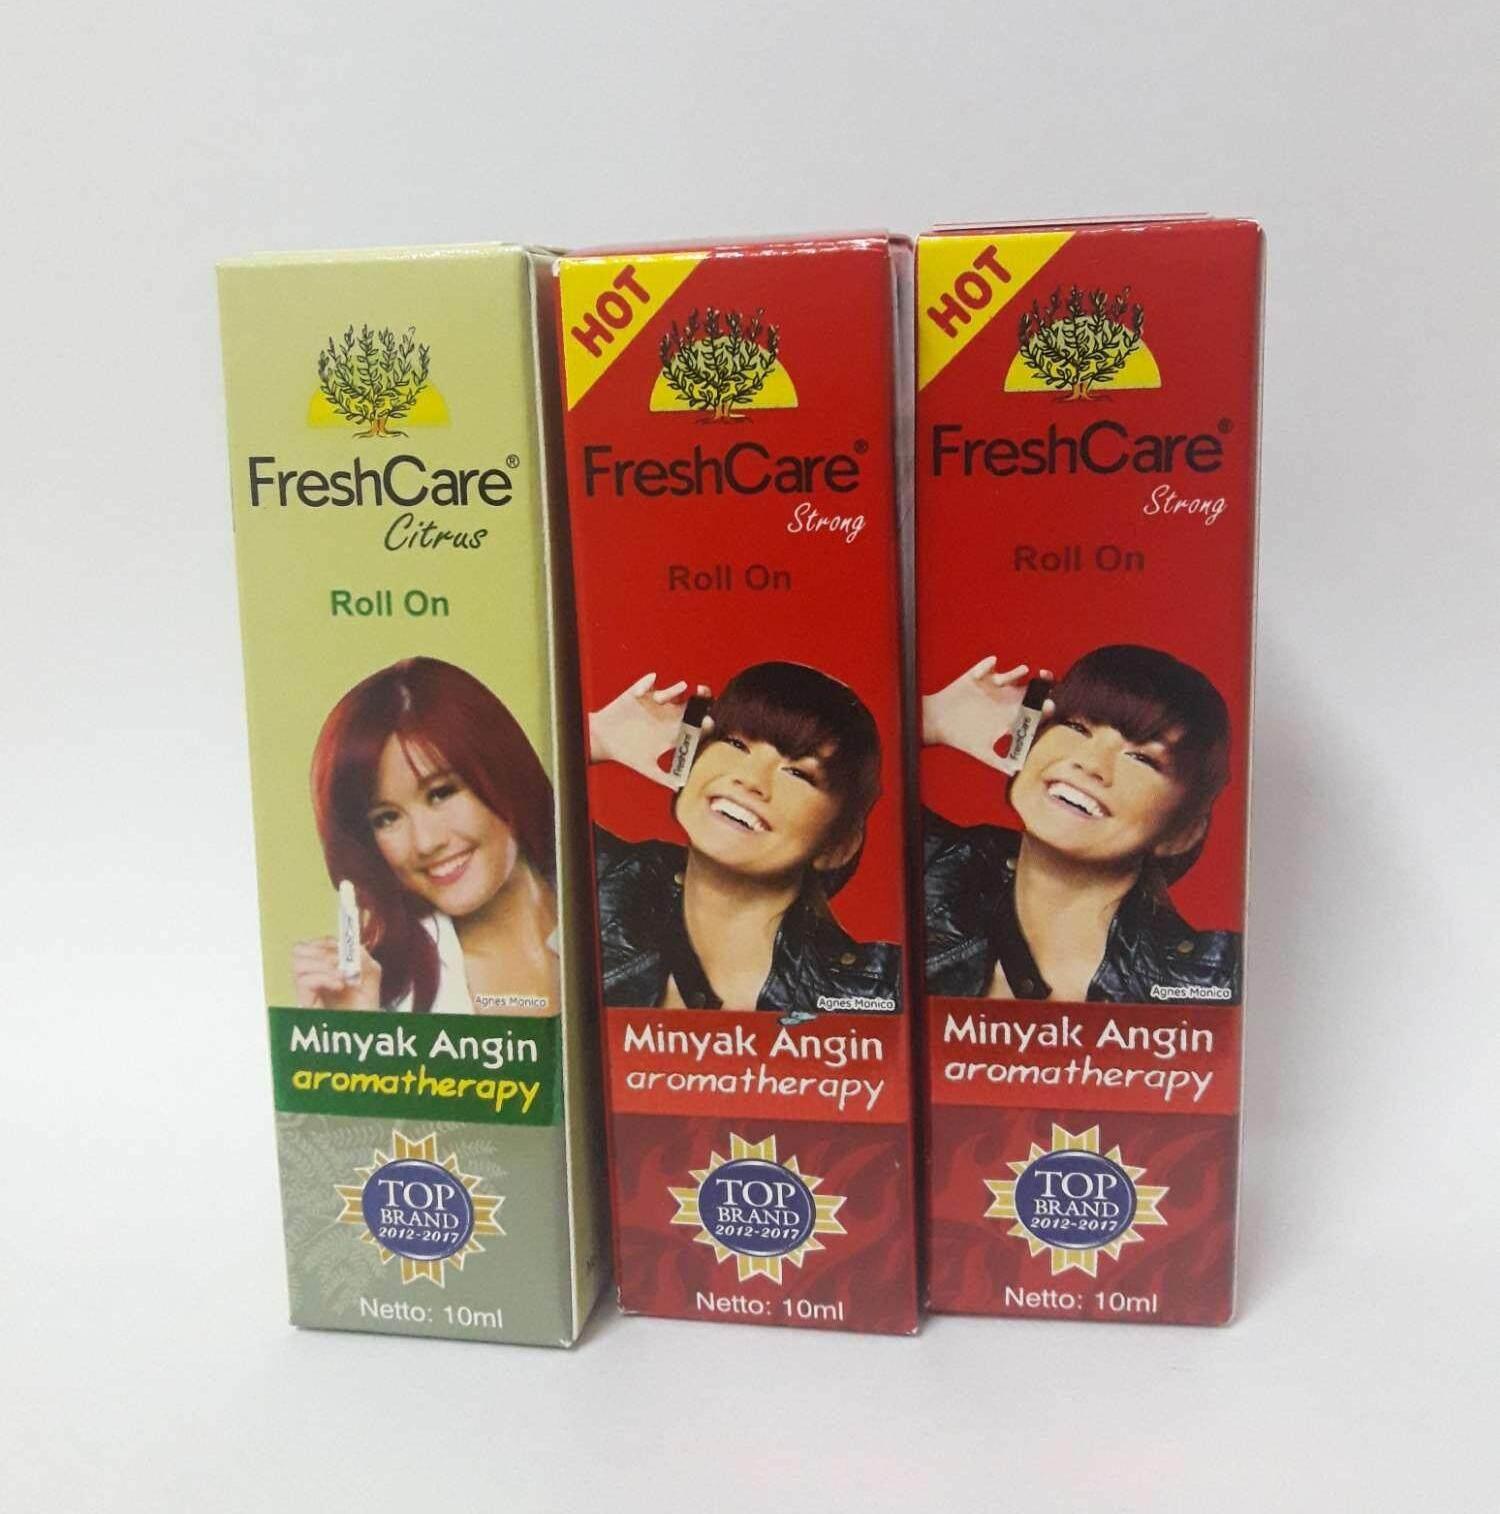 Fresh Care Citrus 2 Botol Daftar Harga Terbaru Dan Terupdate Indonesia Frescare Freshcare 12 Shopee Malaysia Source Aromatheraphy Roll On Mixed Combo Fast